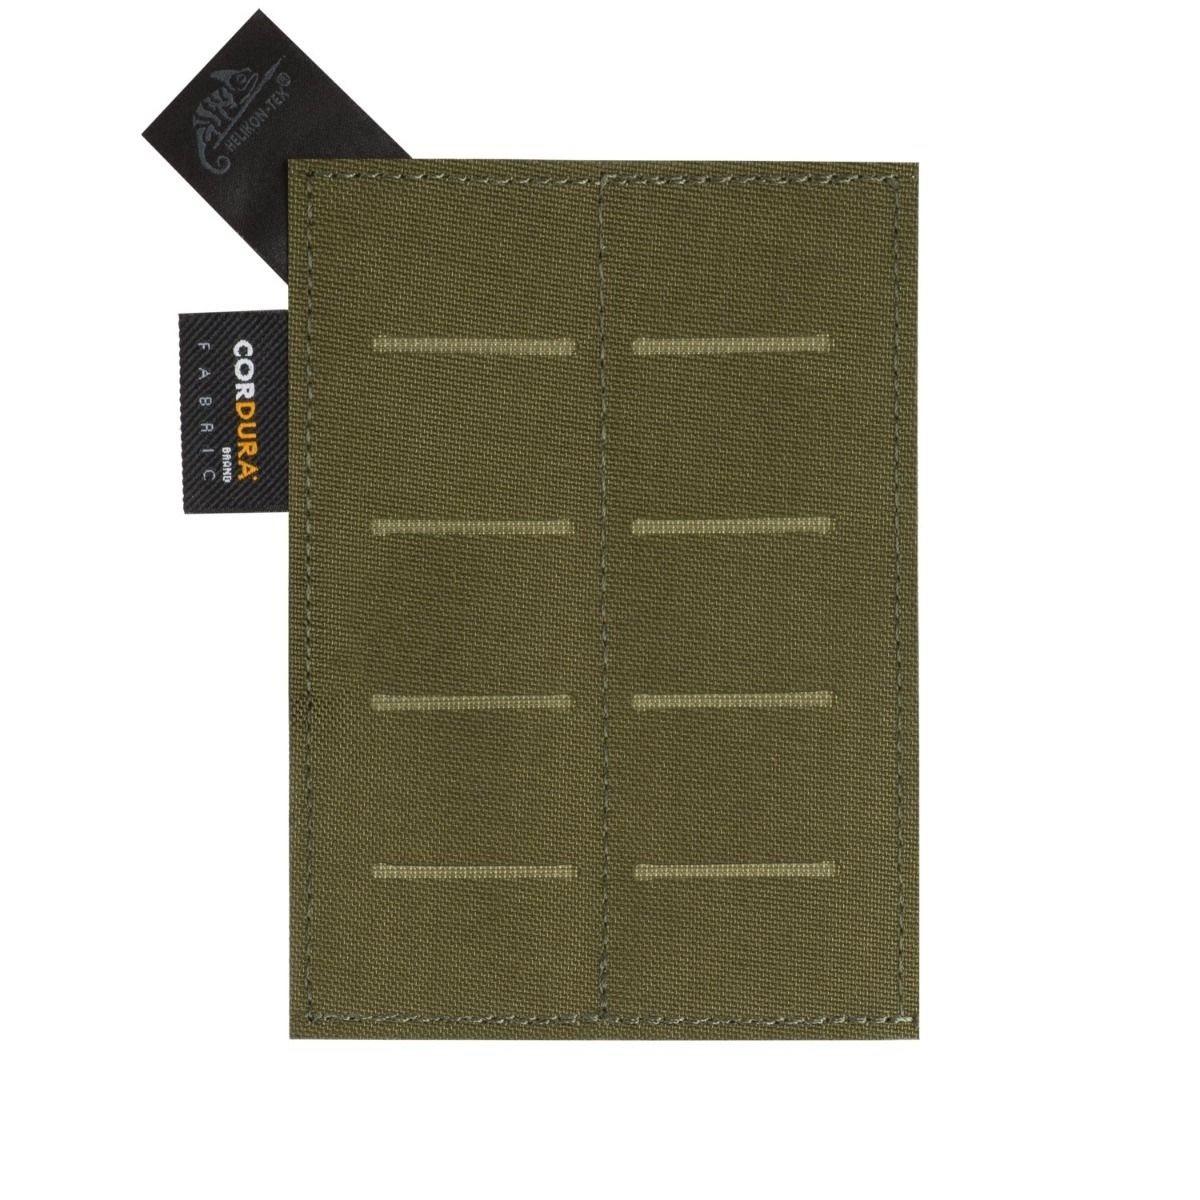 Panel MOLLE INSERT 2® Cordura® OLIVE GREEN